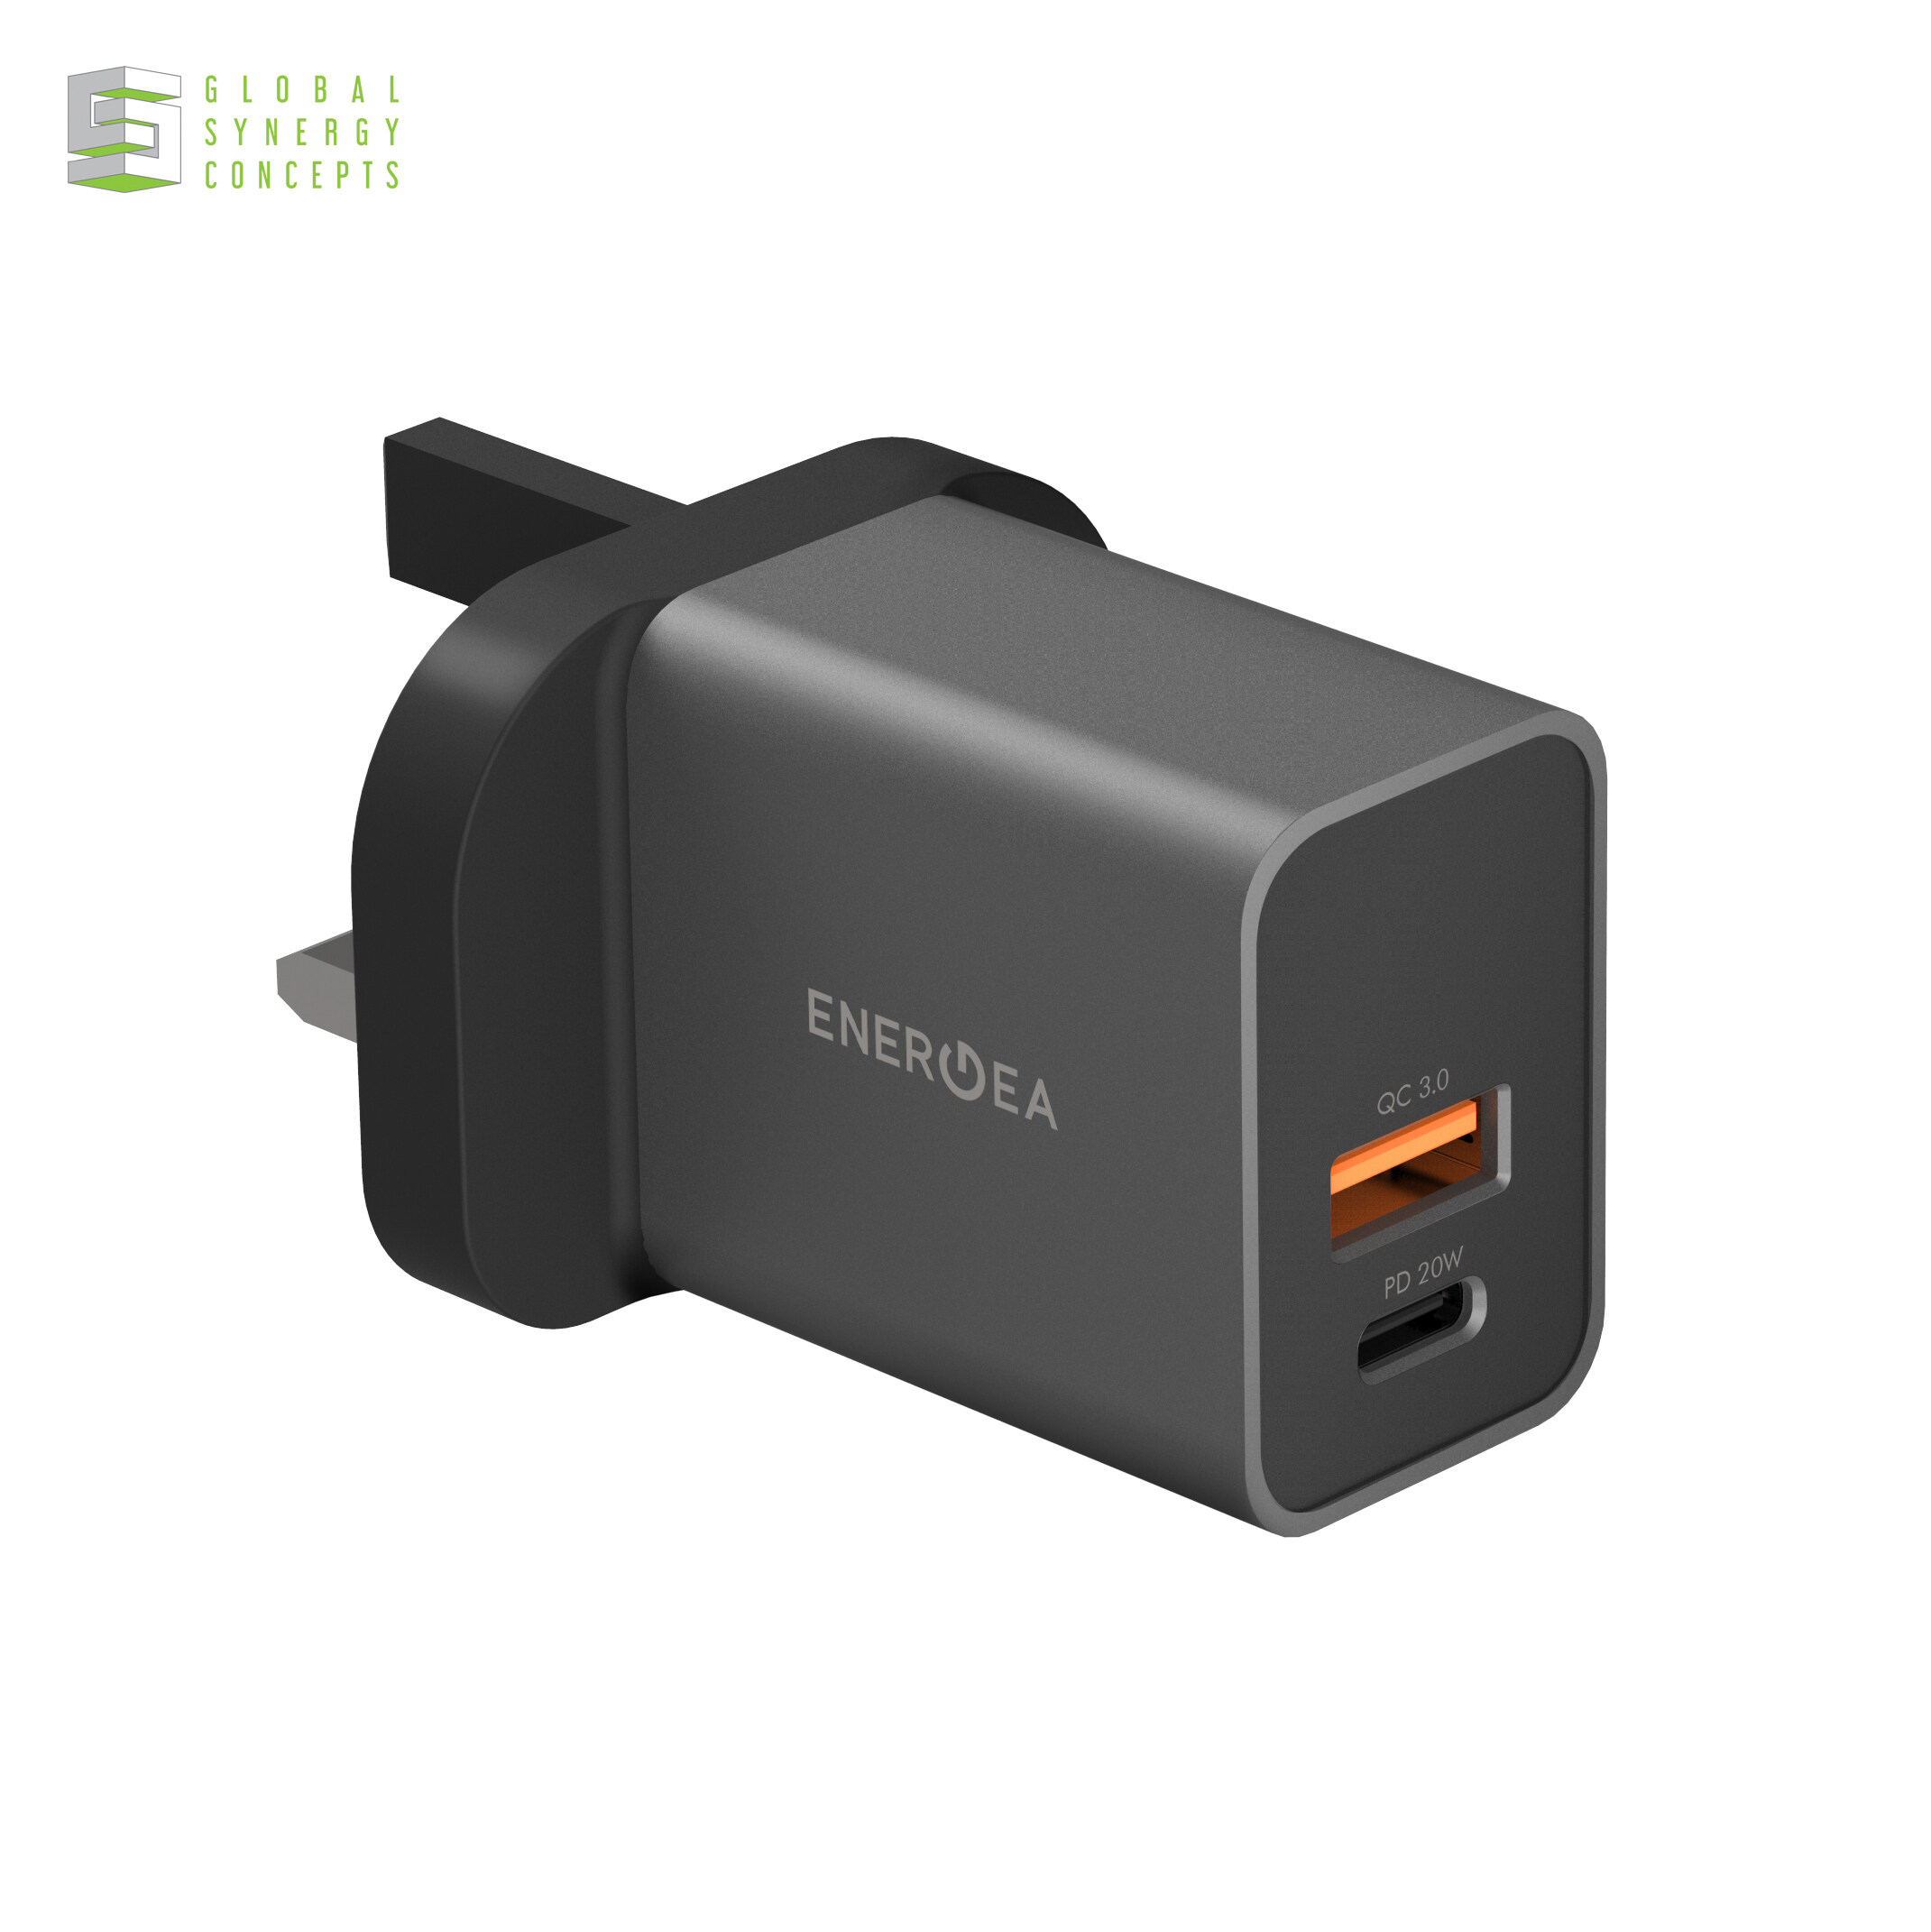 Energea AmpCharge PD20+ PD USB-C + QC USB-A PORT WALL CHARGER, 20W (UK)